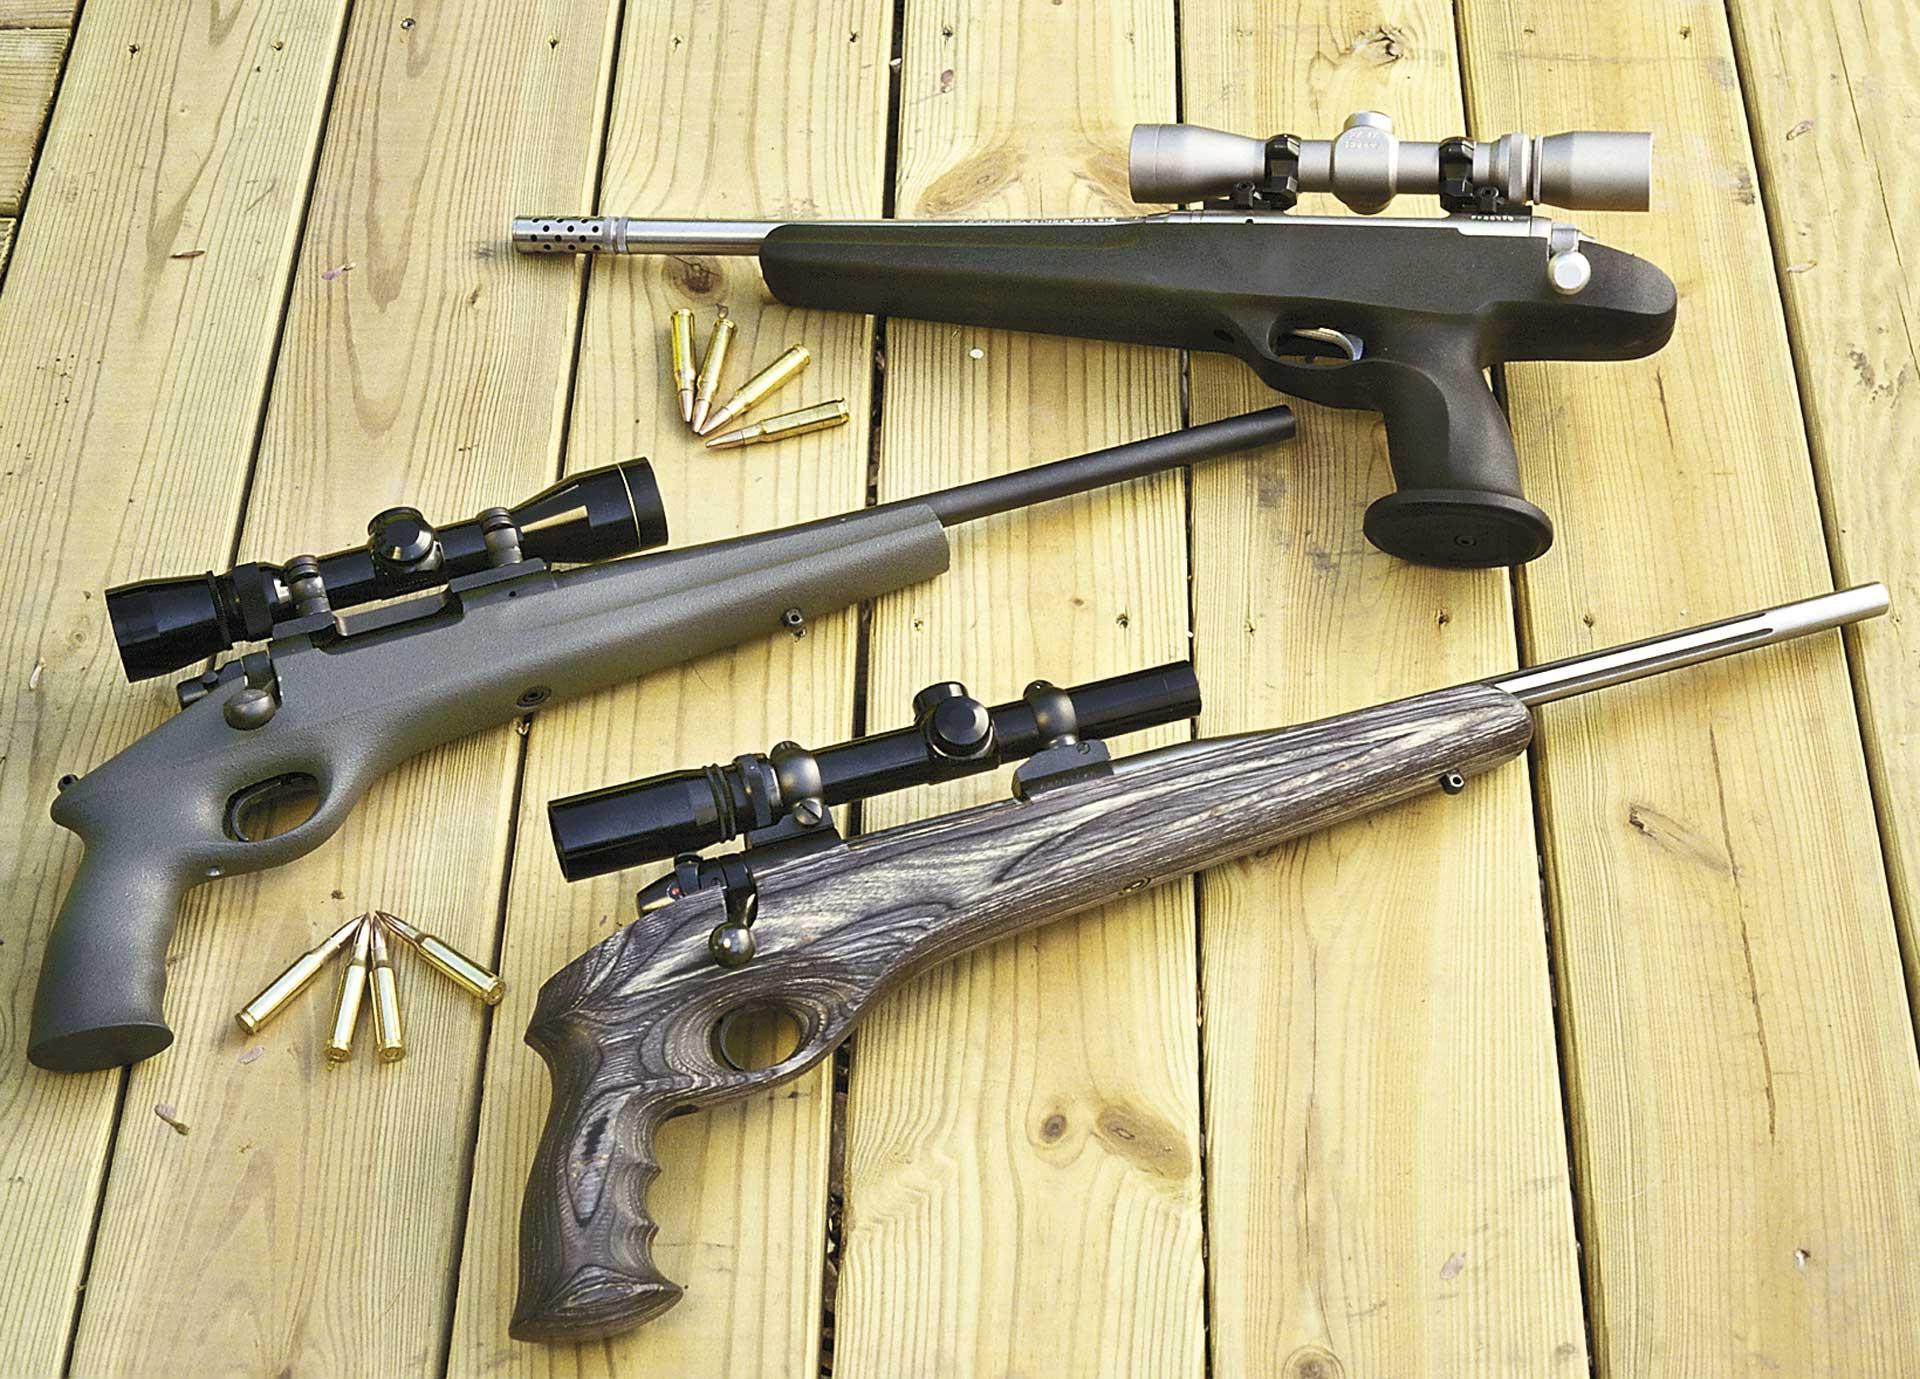 outdoors wood planks baords guns pistols three